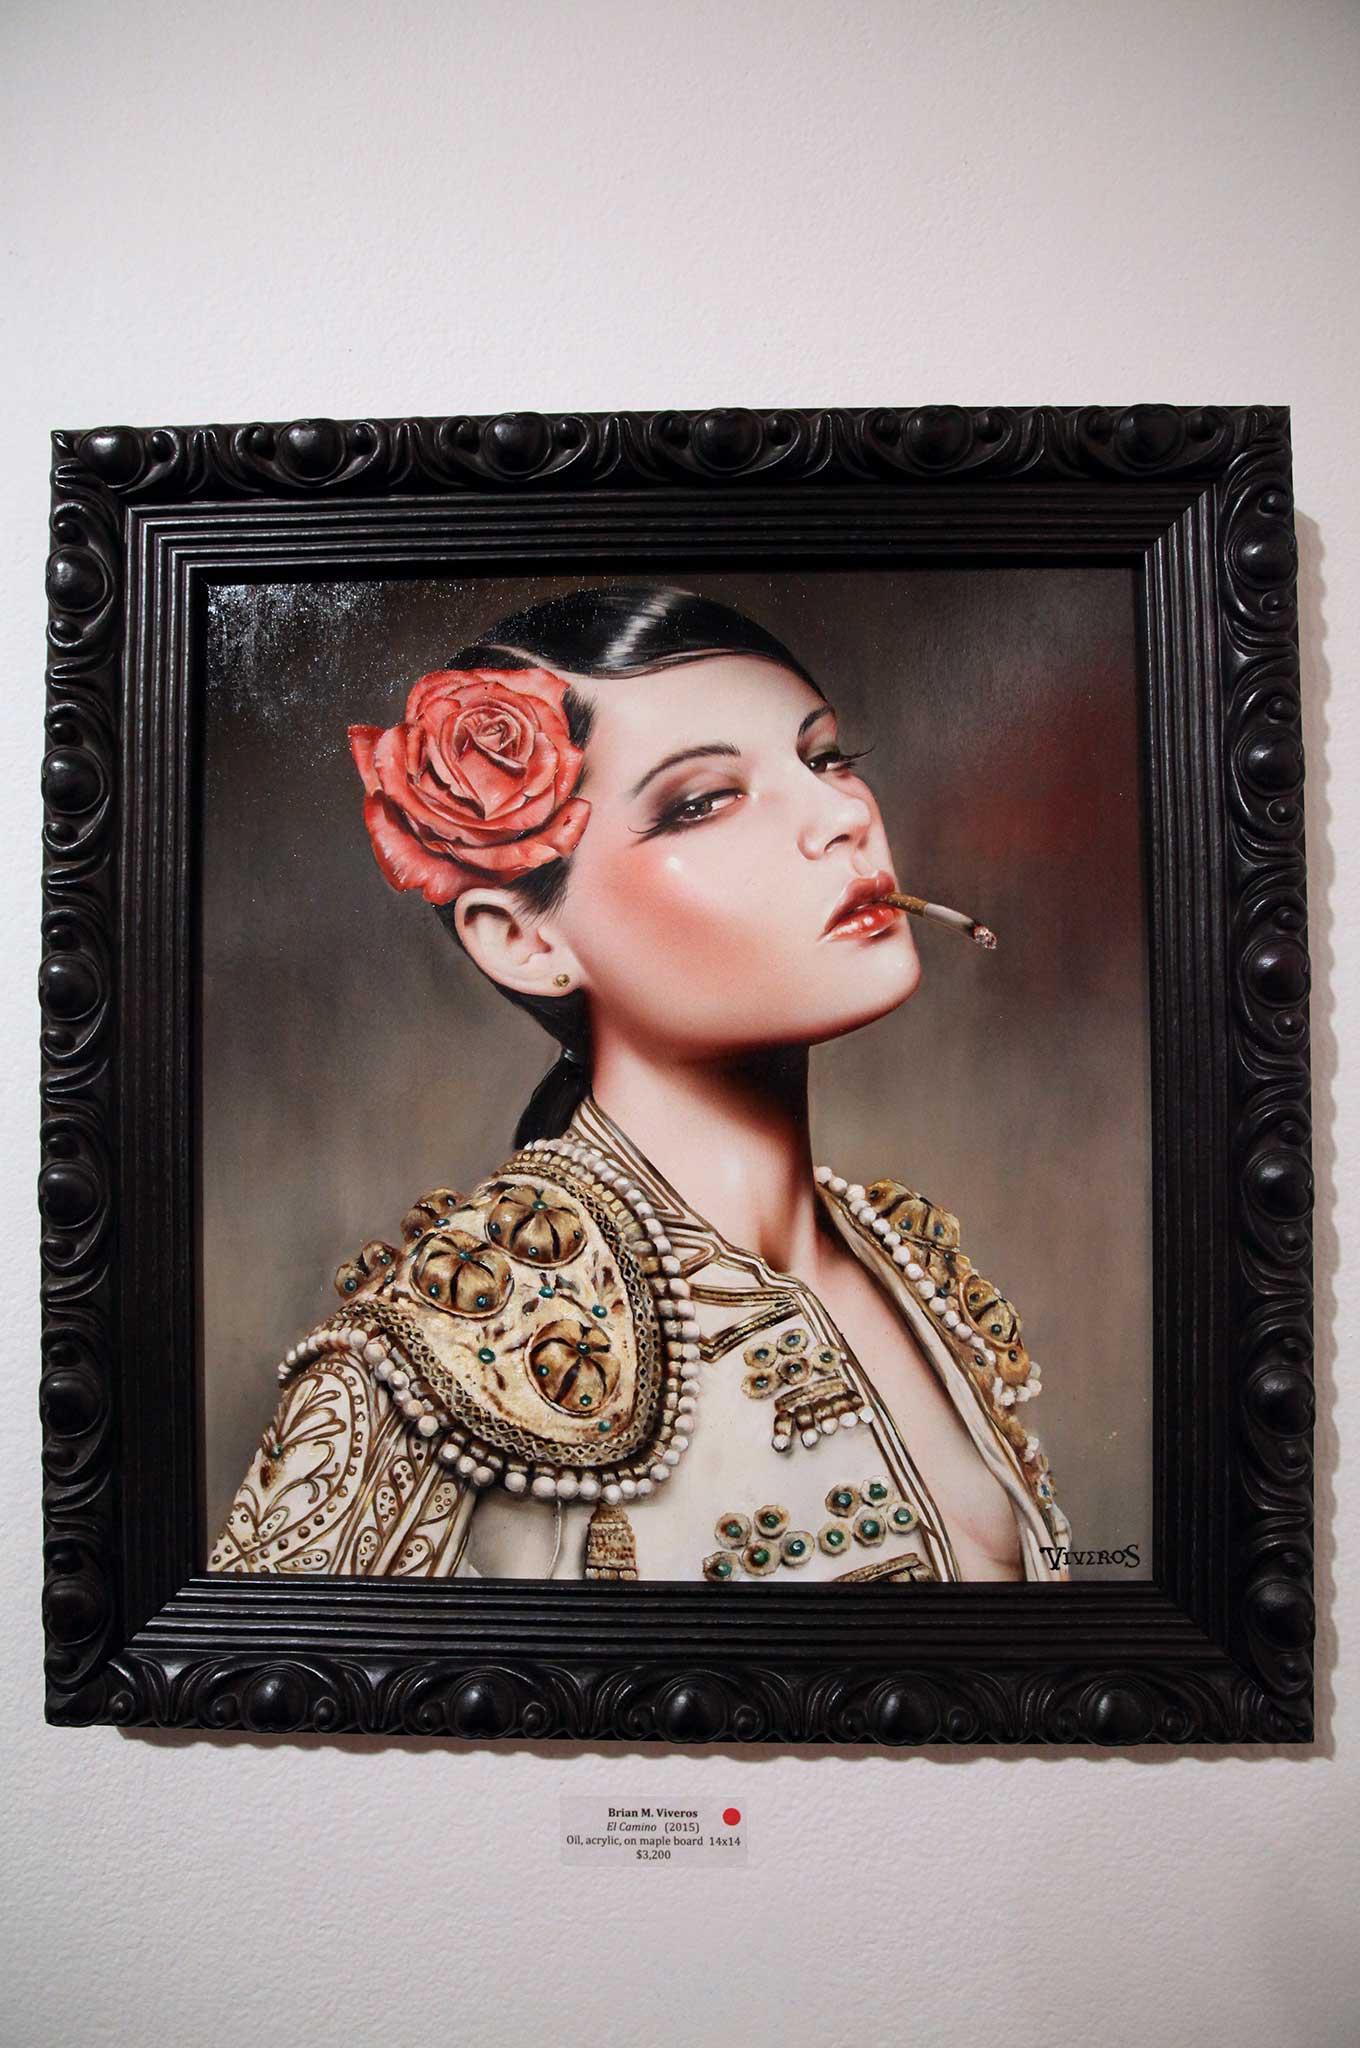 matador art exhibition brian m viveros artwork 019